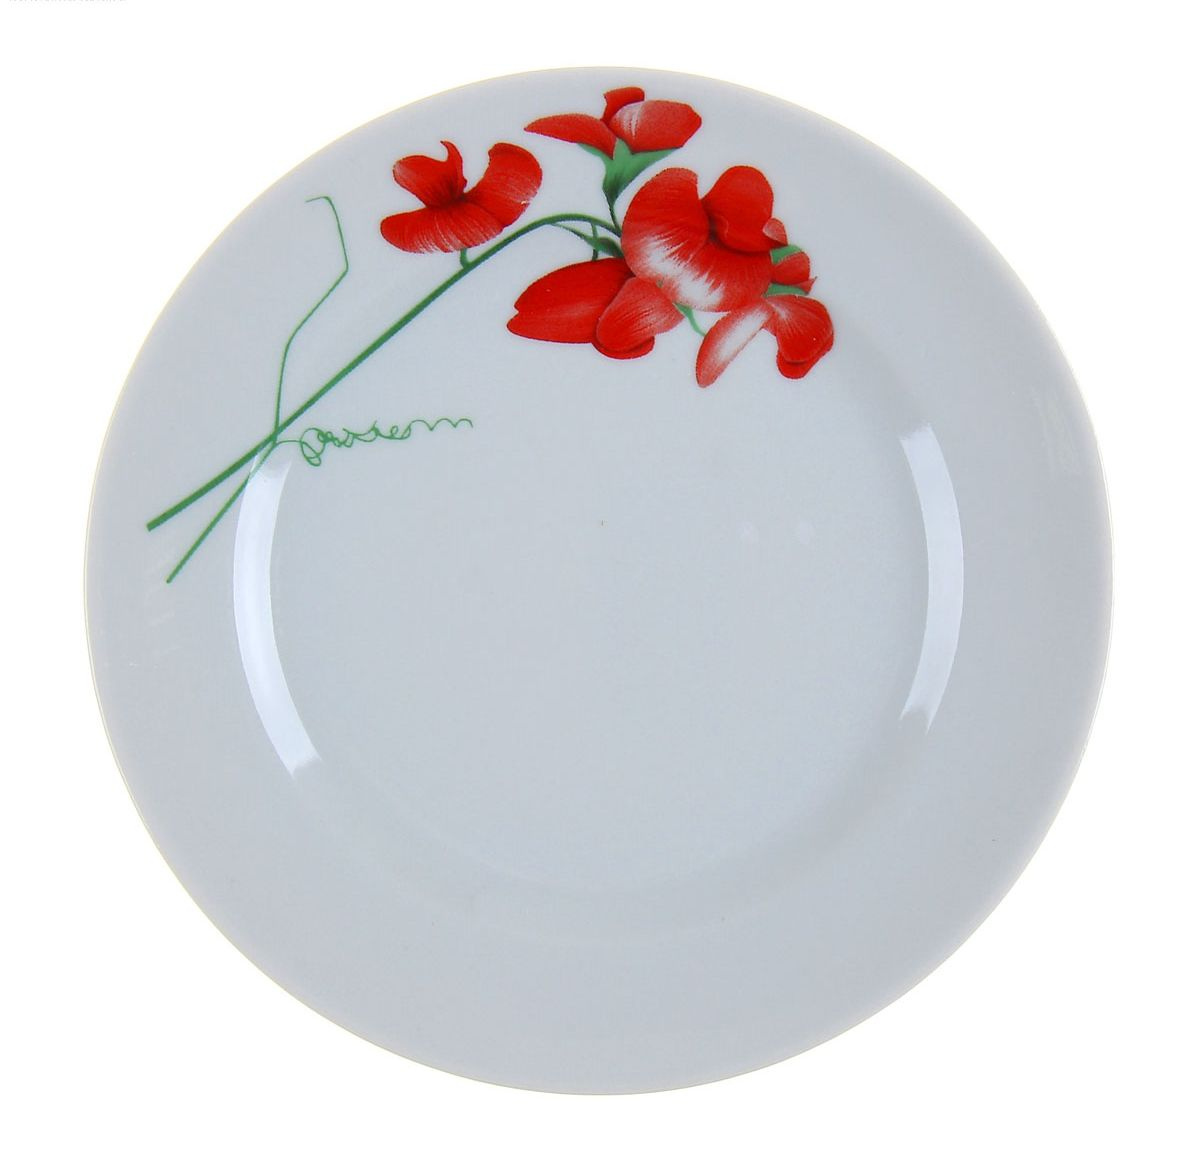 Тарелка мелкая Идиллия. Рубин, диаметр 17 см. 11094981109498